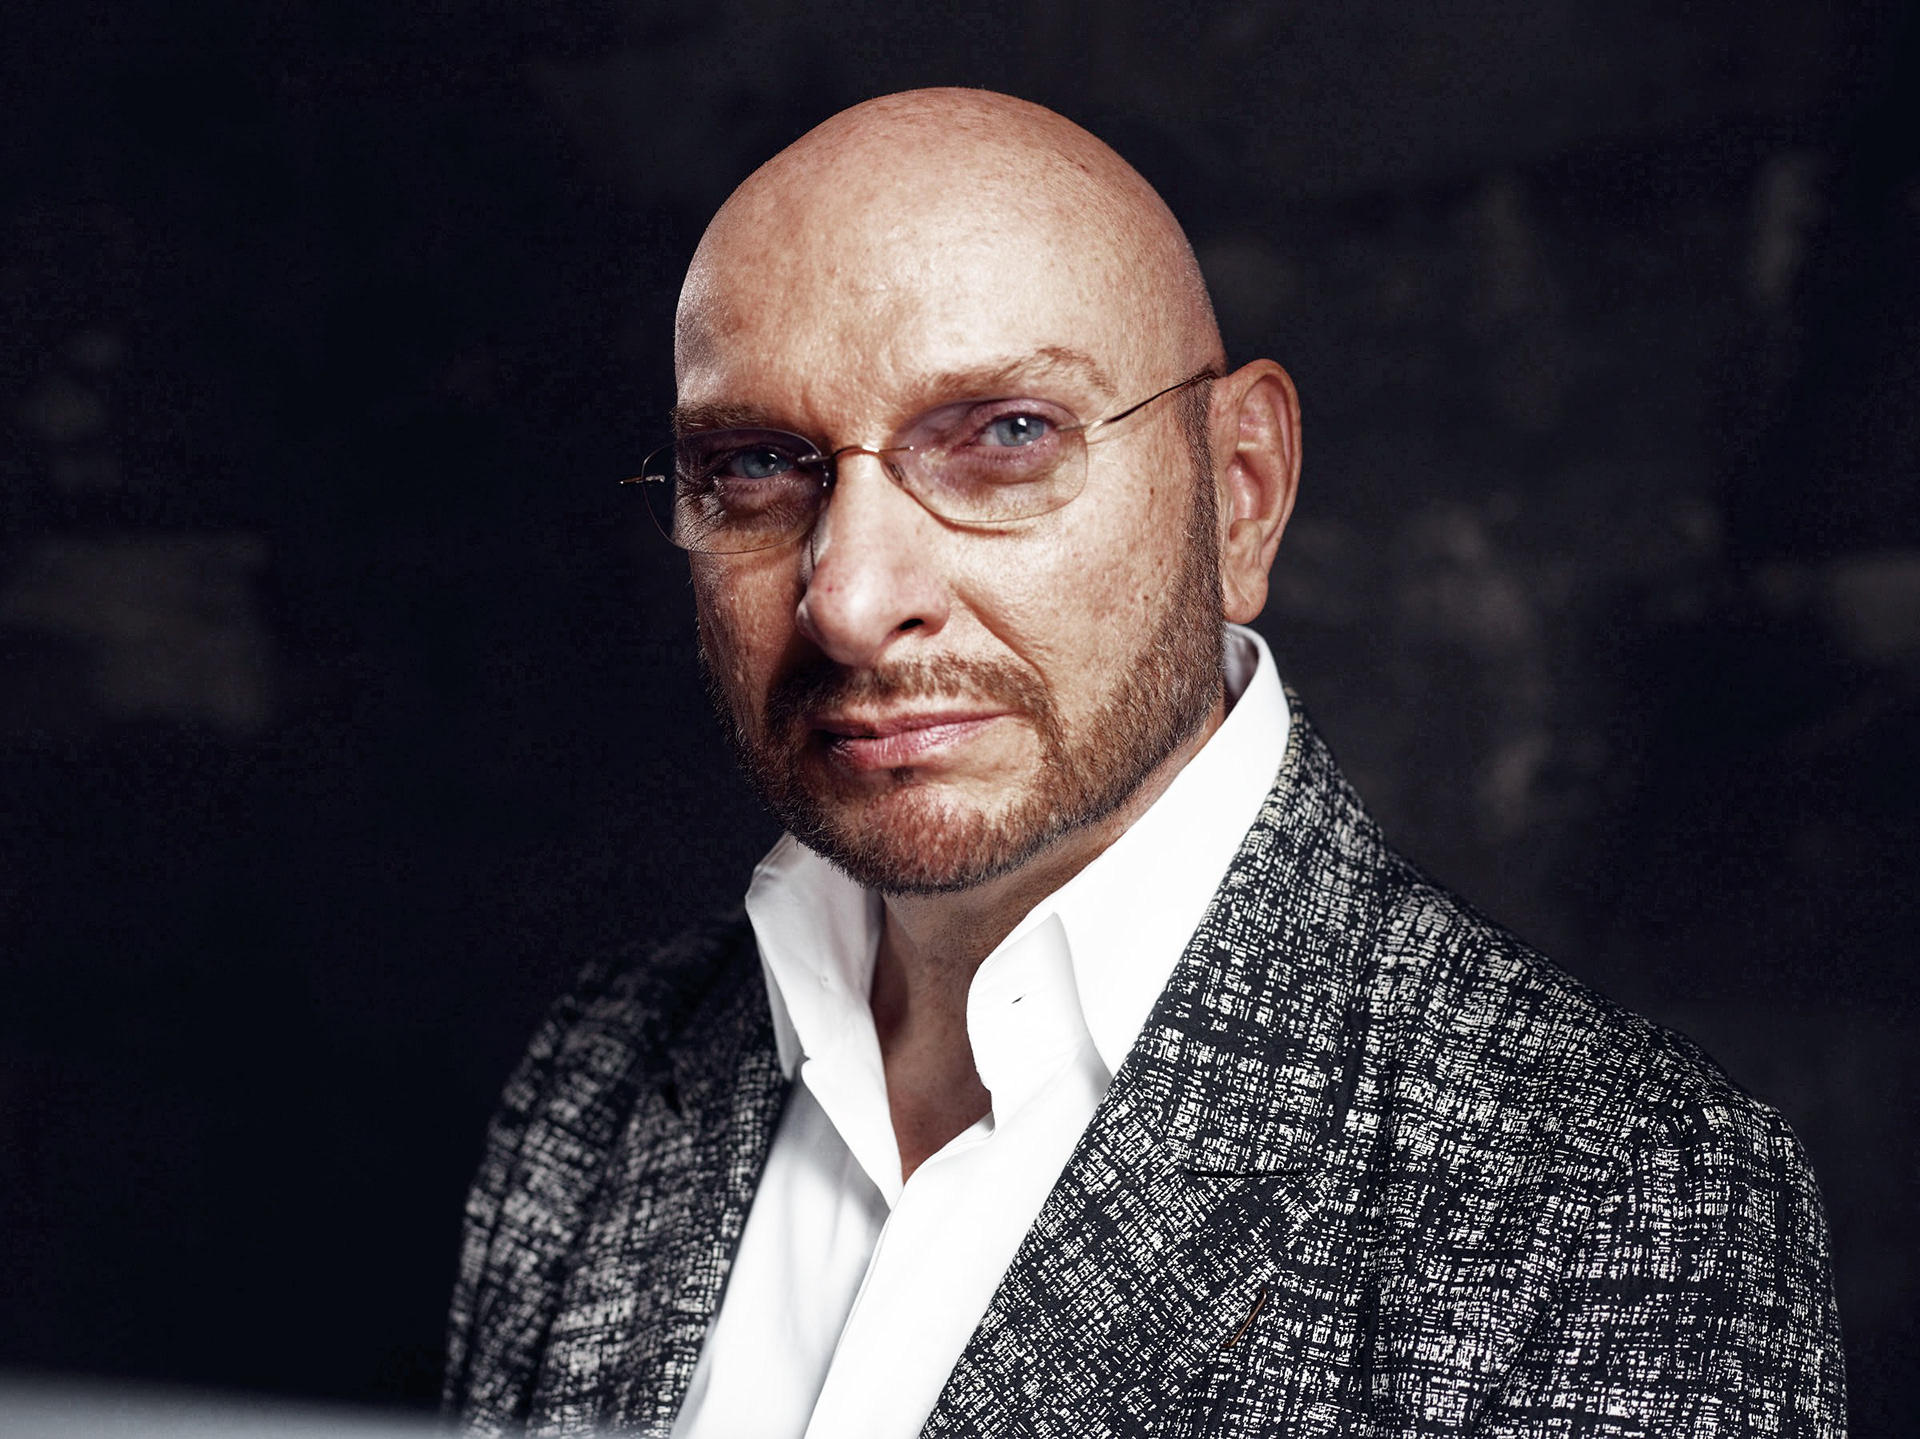 Ralf Morgenstern